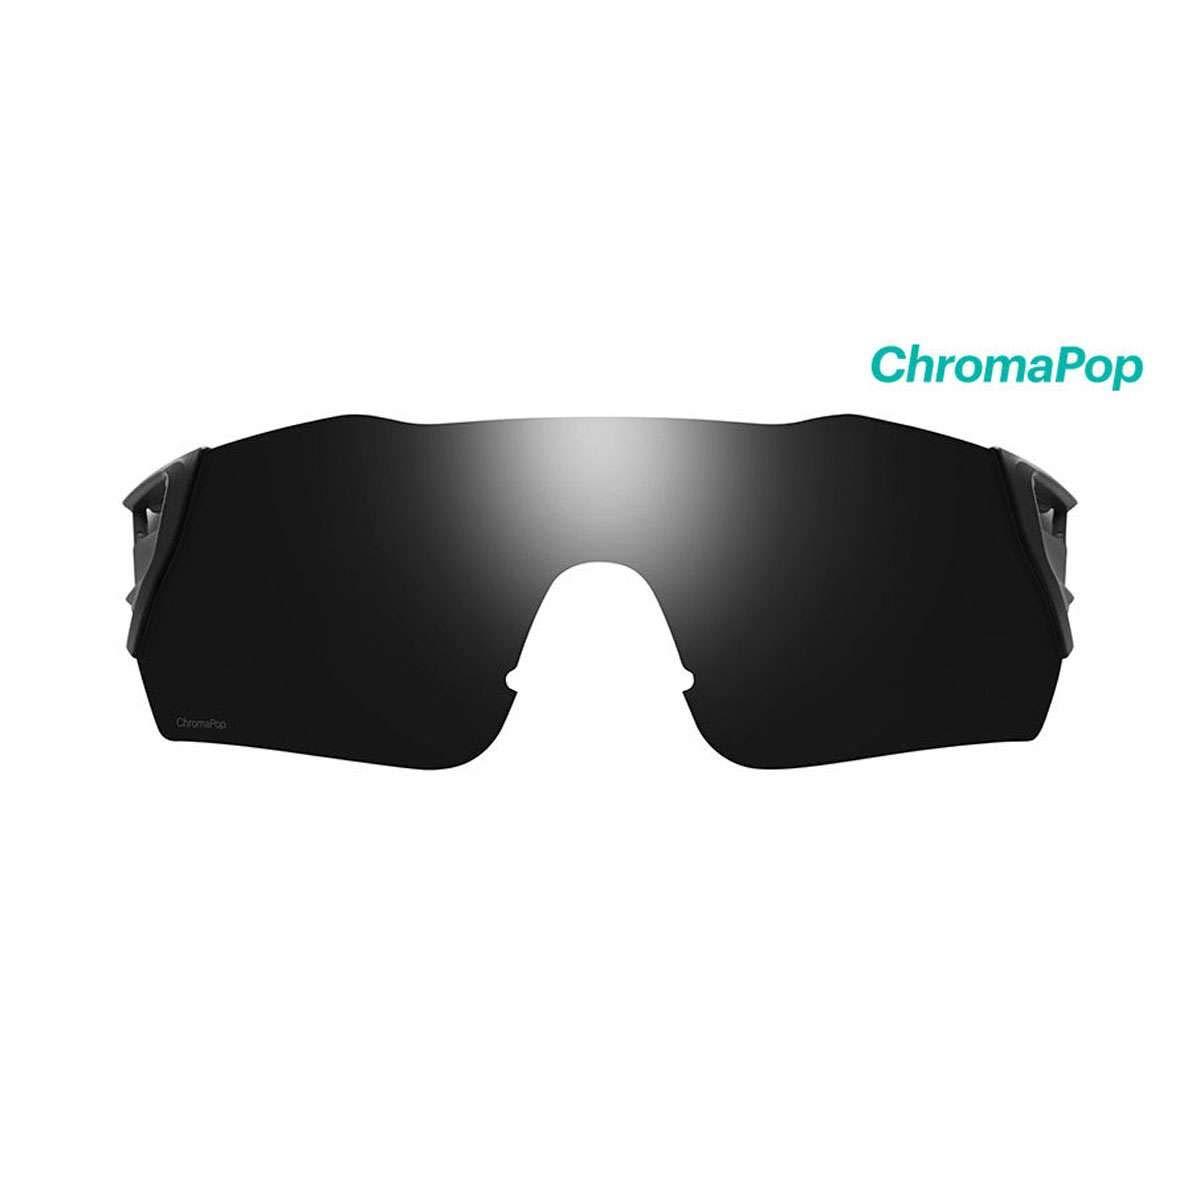 Smith Optics Attack Sunglasses - Replacement Lens - ChromaPop Black - 421014LEN001C by Smith Optics